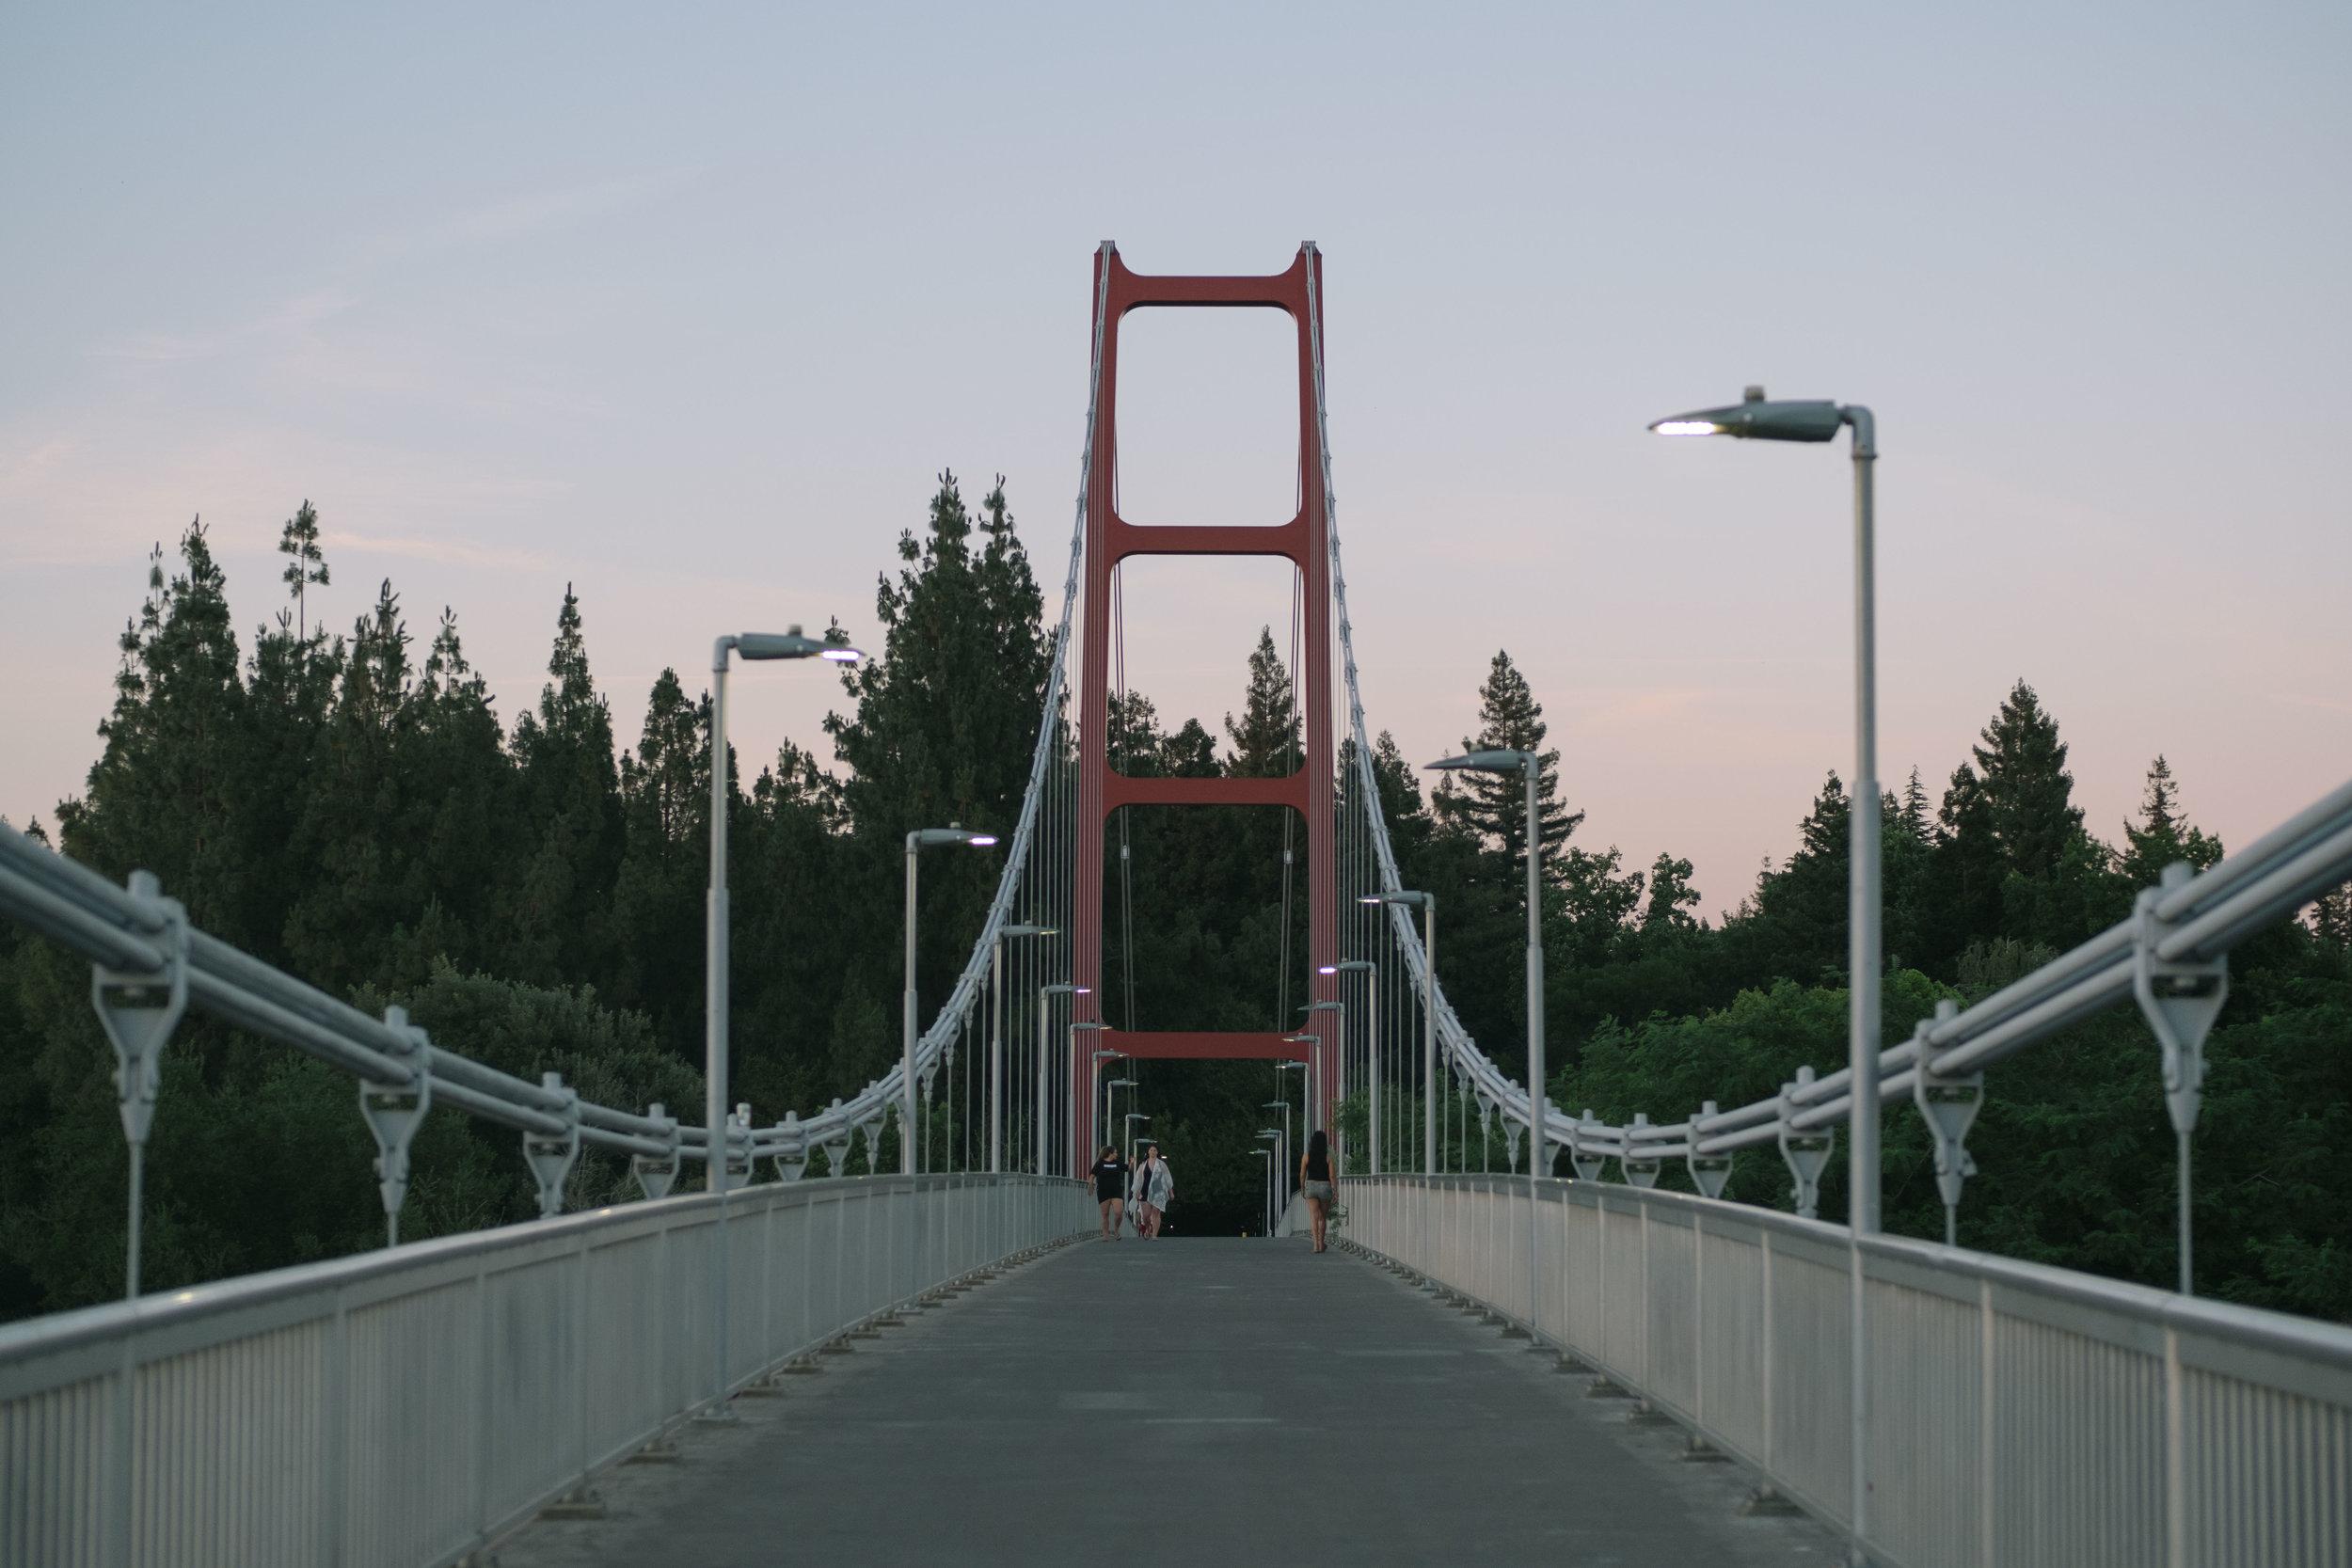 Shani_Leead_Sacramento_Point_Reyes-41-USE.jpg